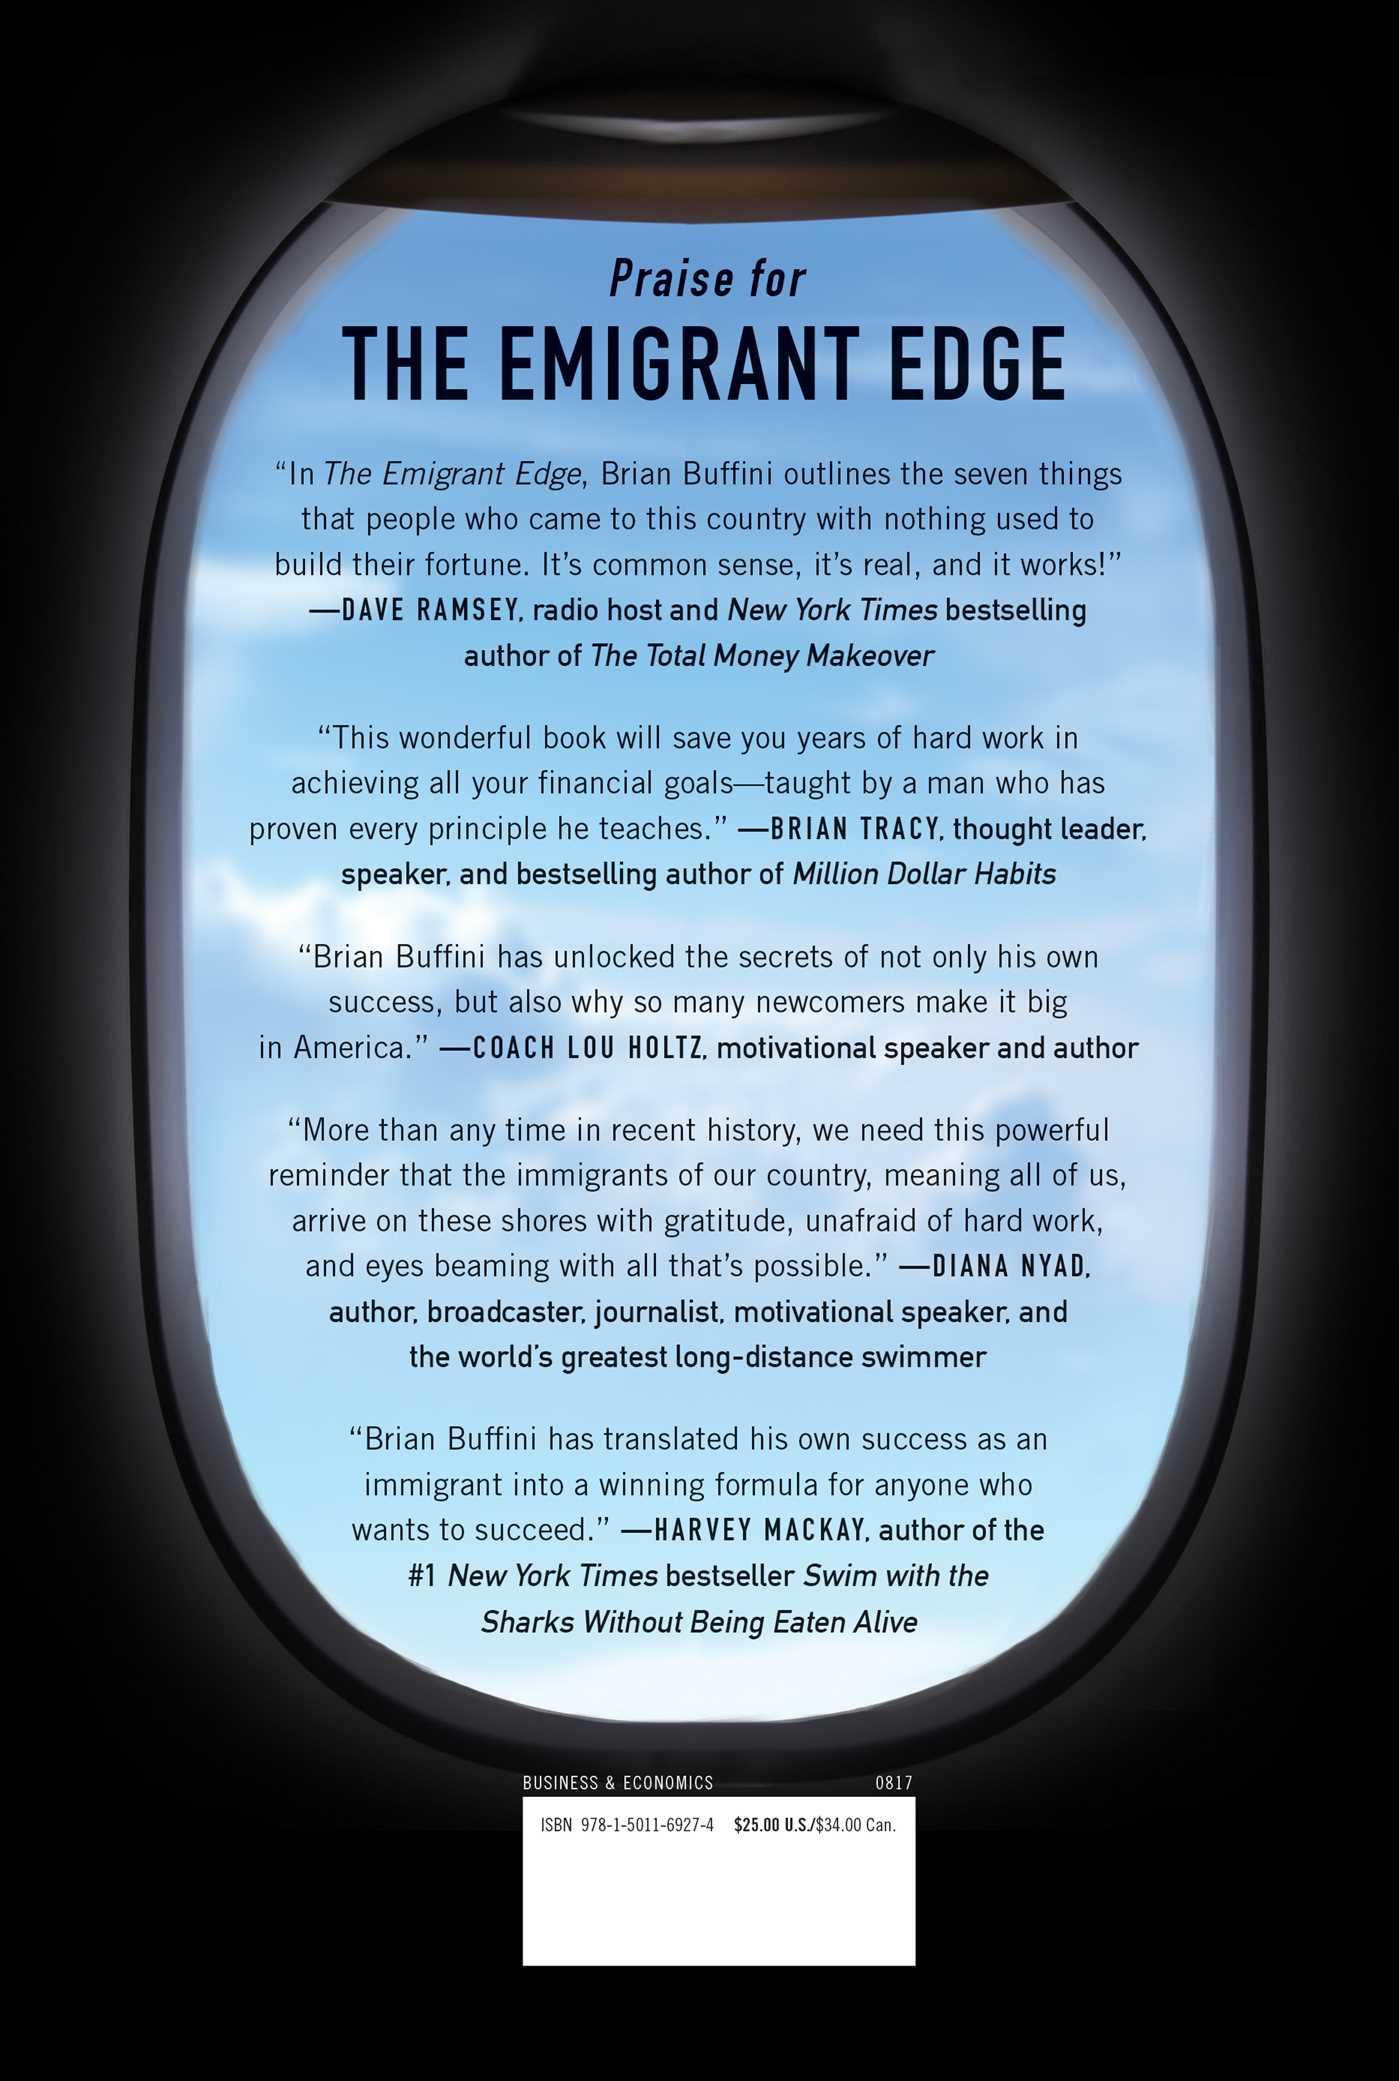 The emigrant edge 9781501169274 hr back